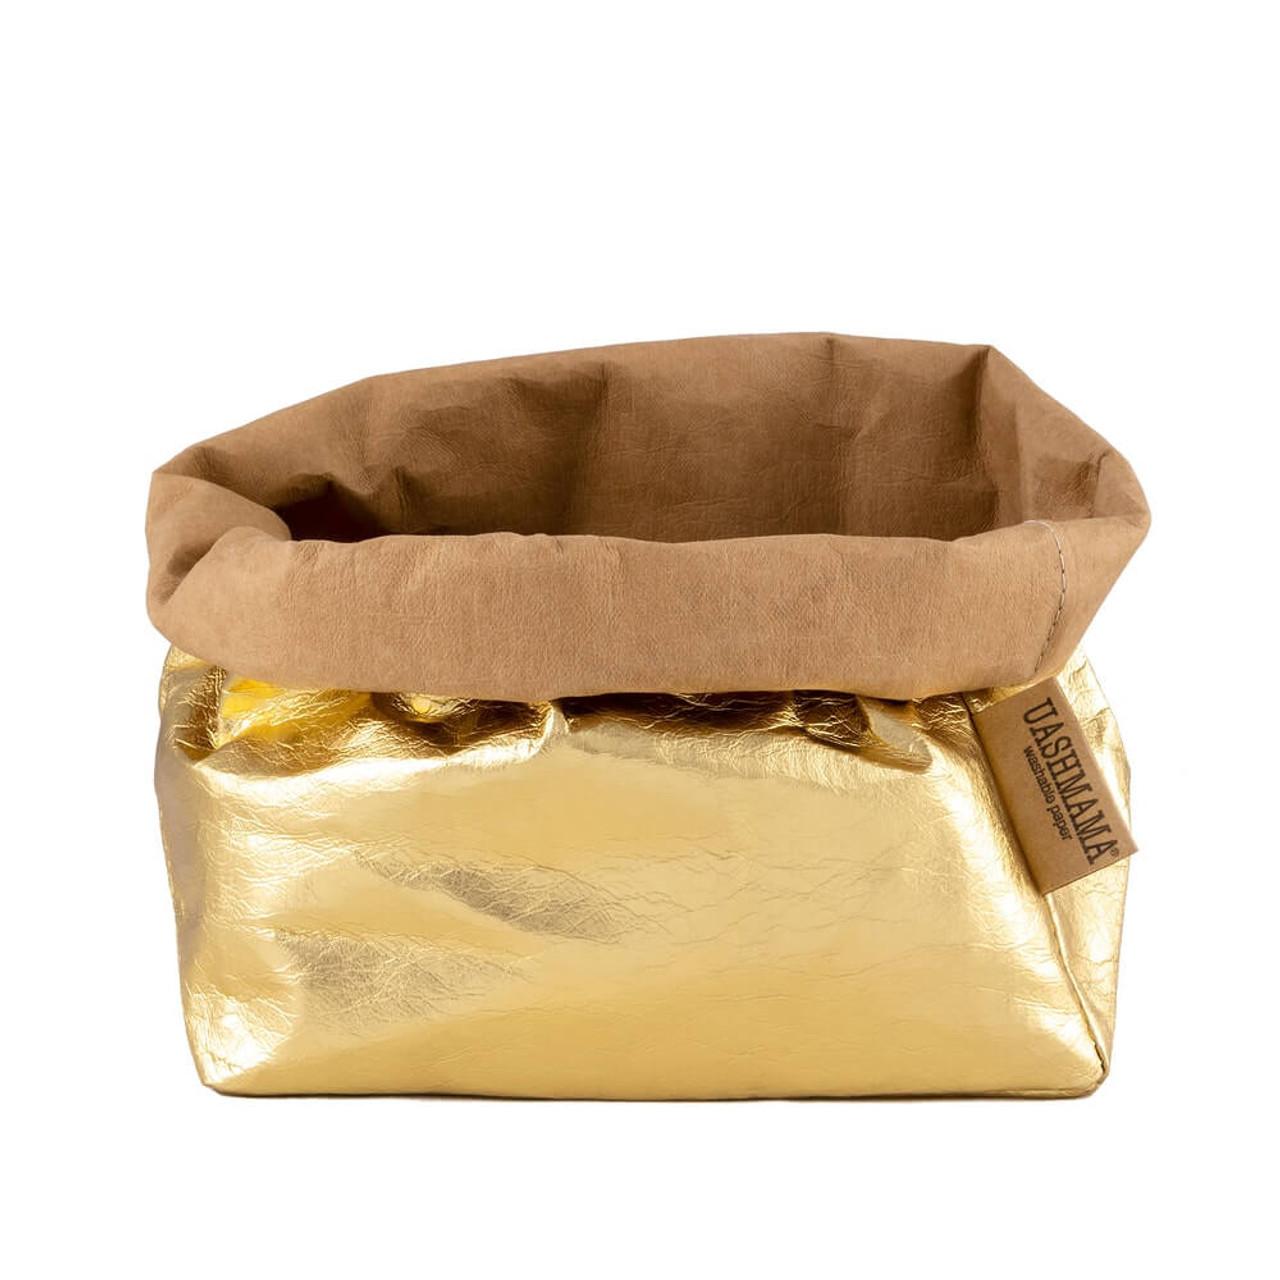 UASHMAMA large organic paper bags metallo